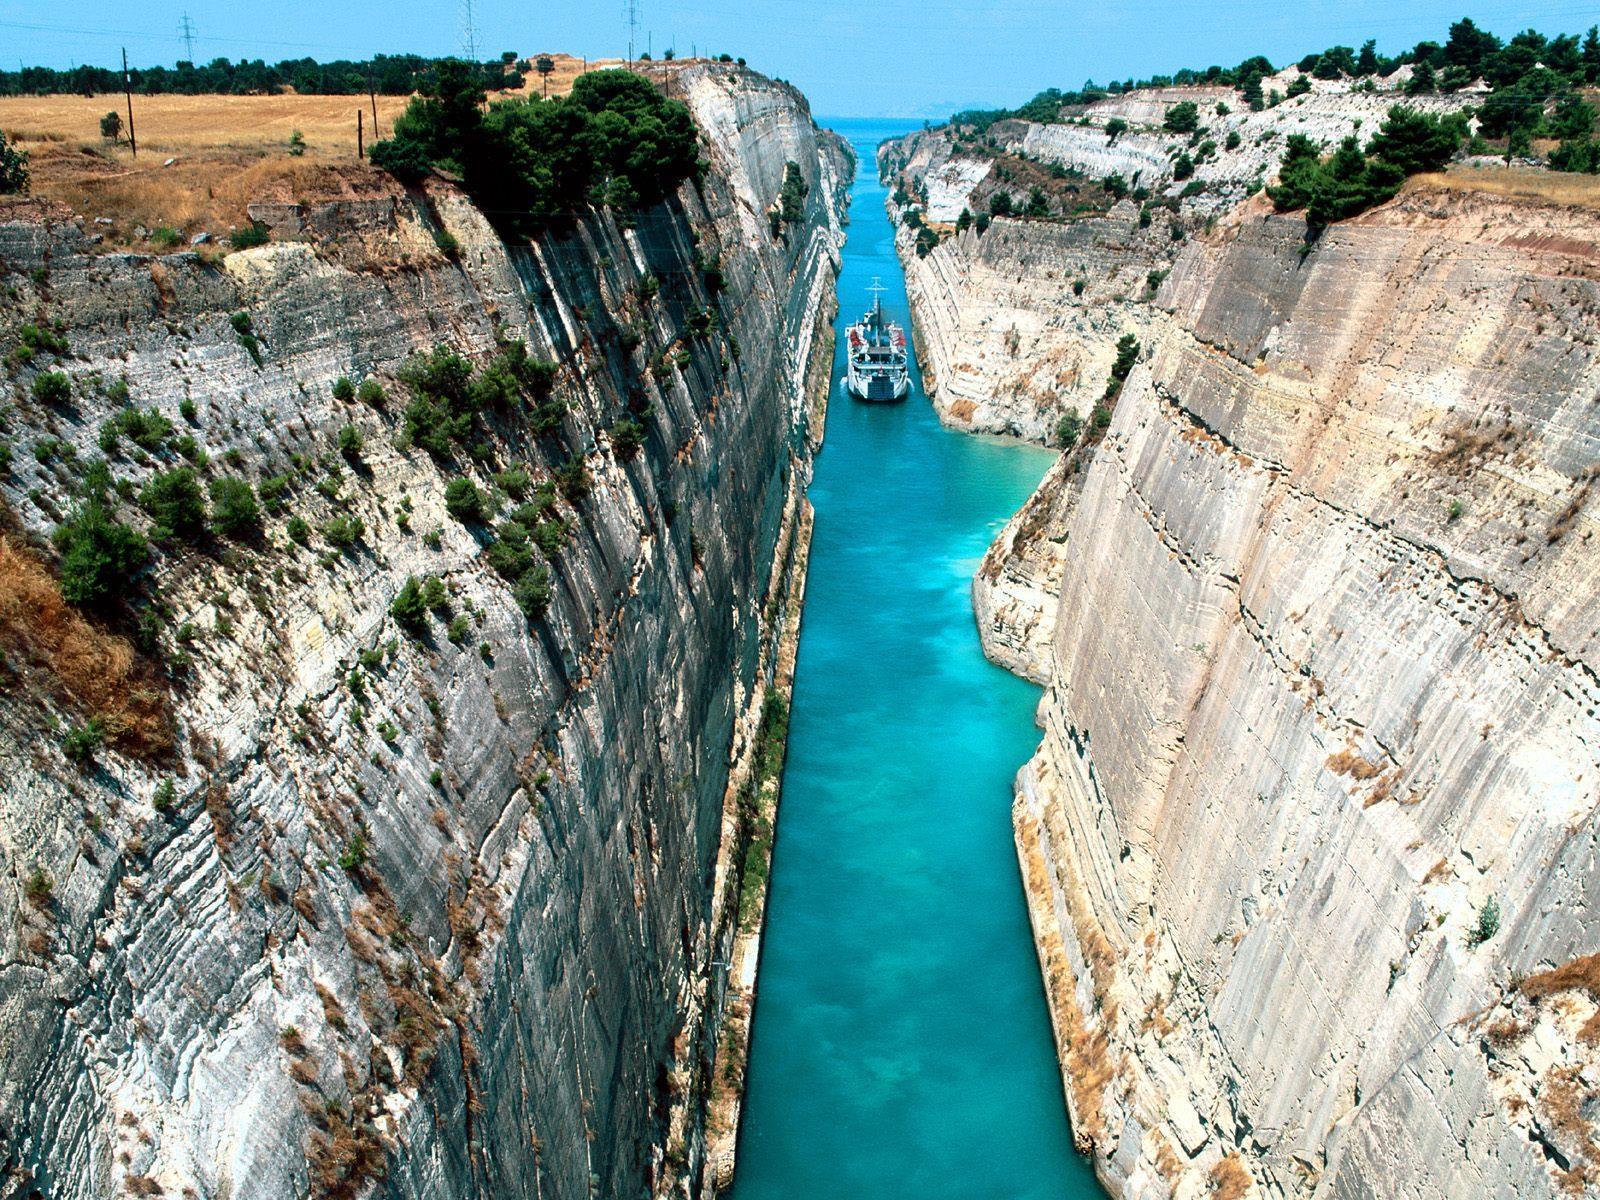 grece_canal-de-corinthe